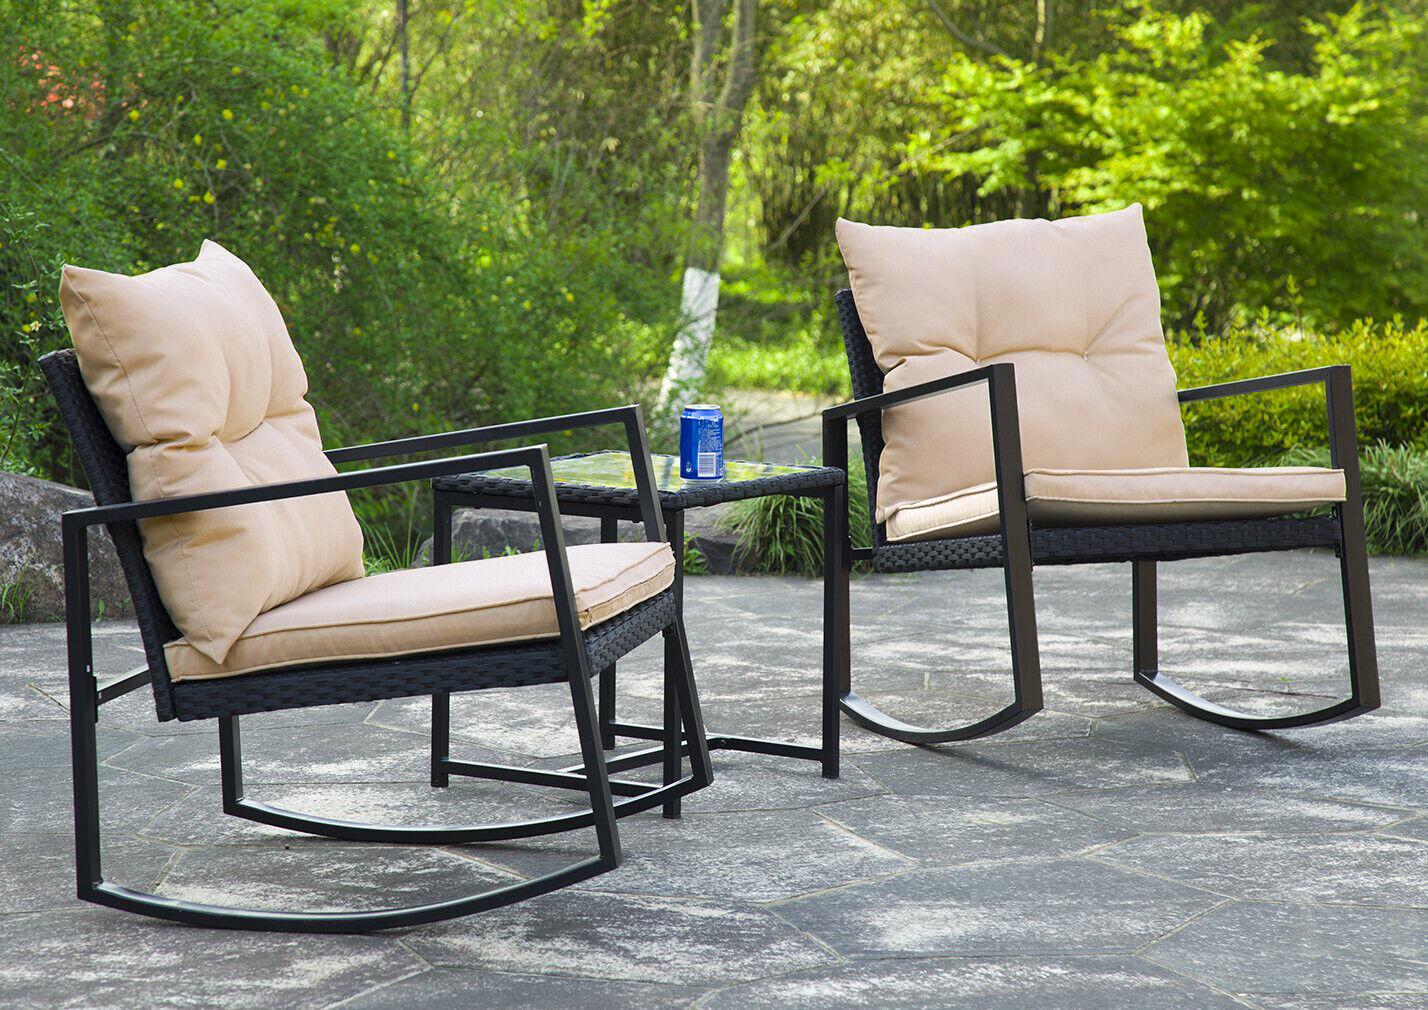 3 Pieces Patio Set Outdoor Wicker Patio  Sets Rocking  Coffee Table ,Black Dining Sets